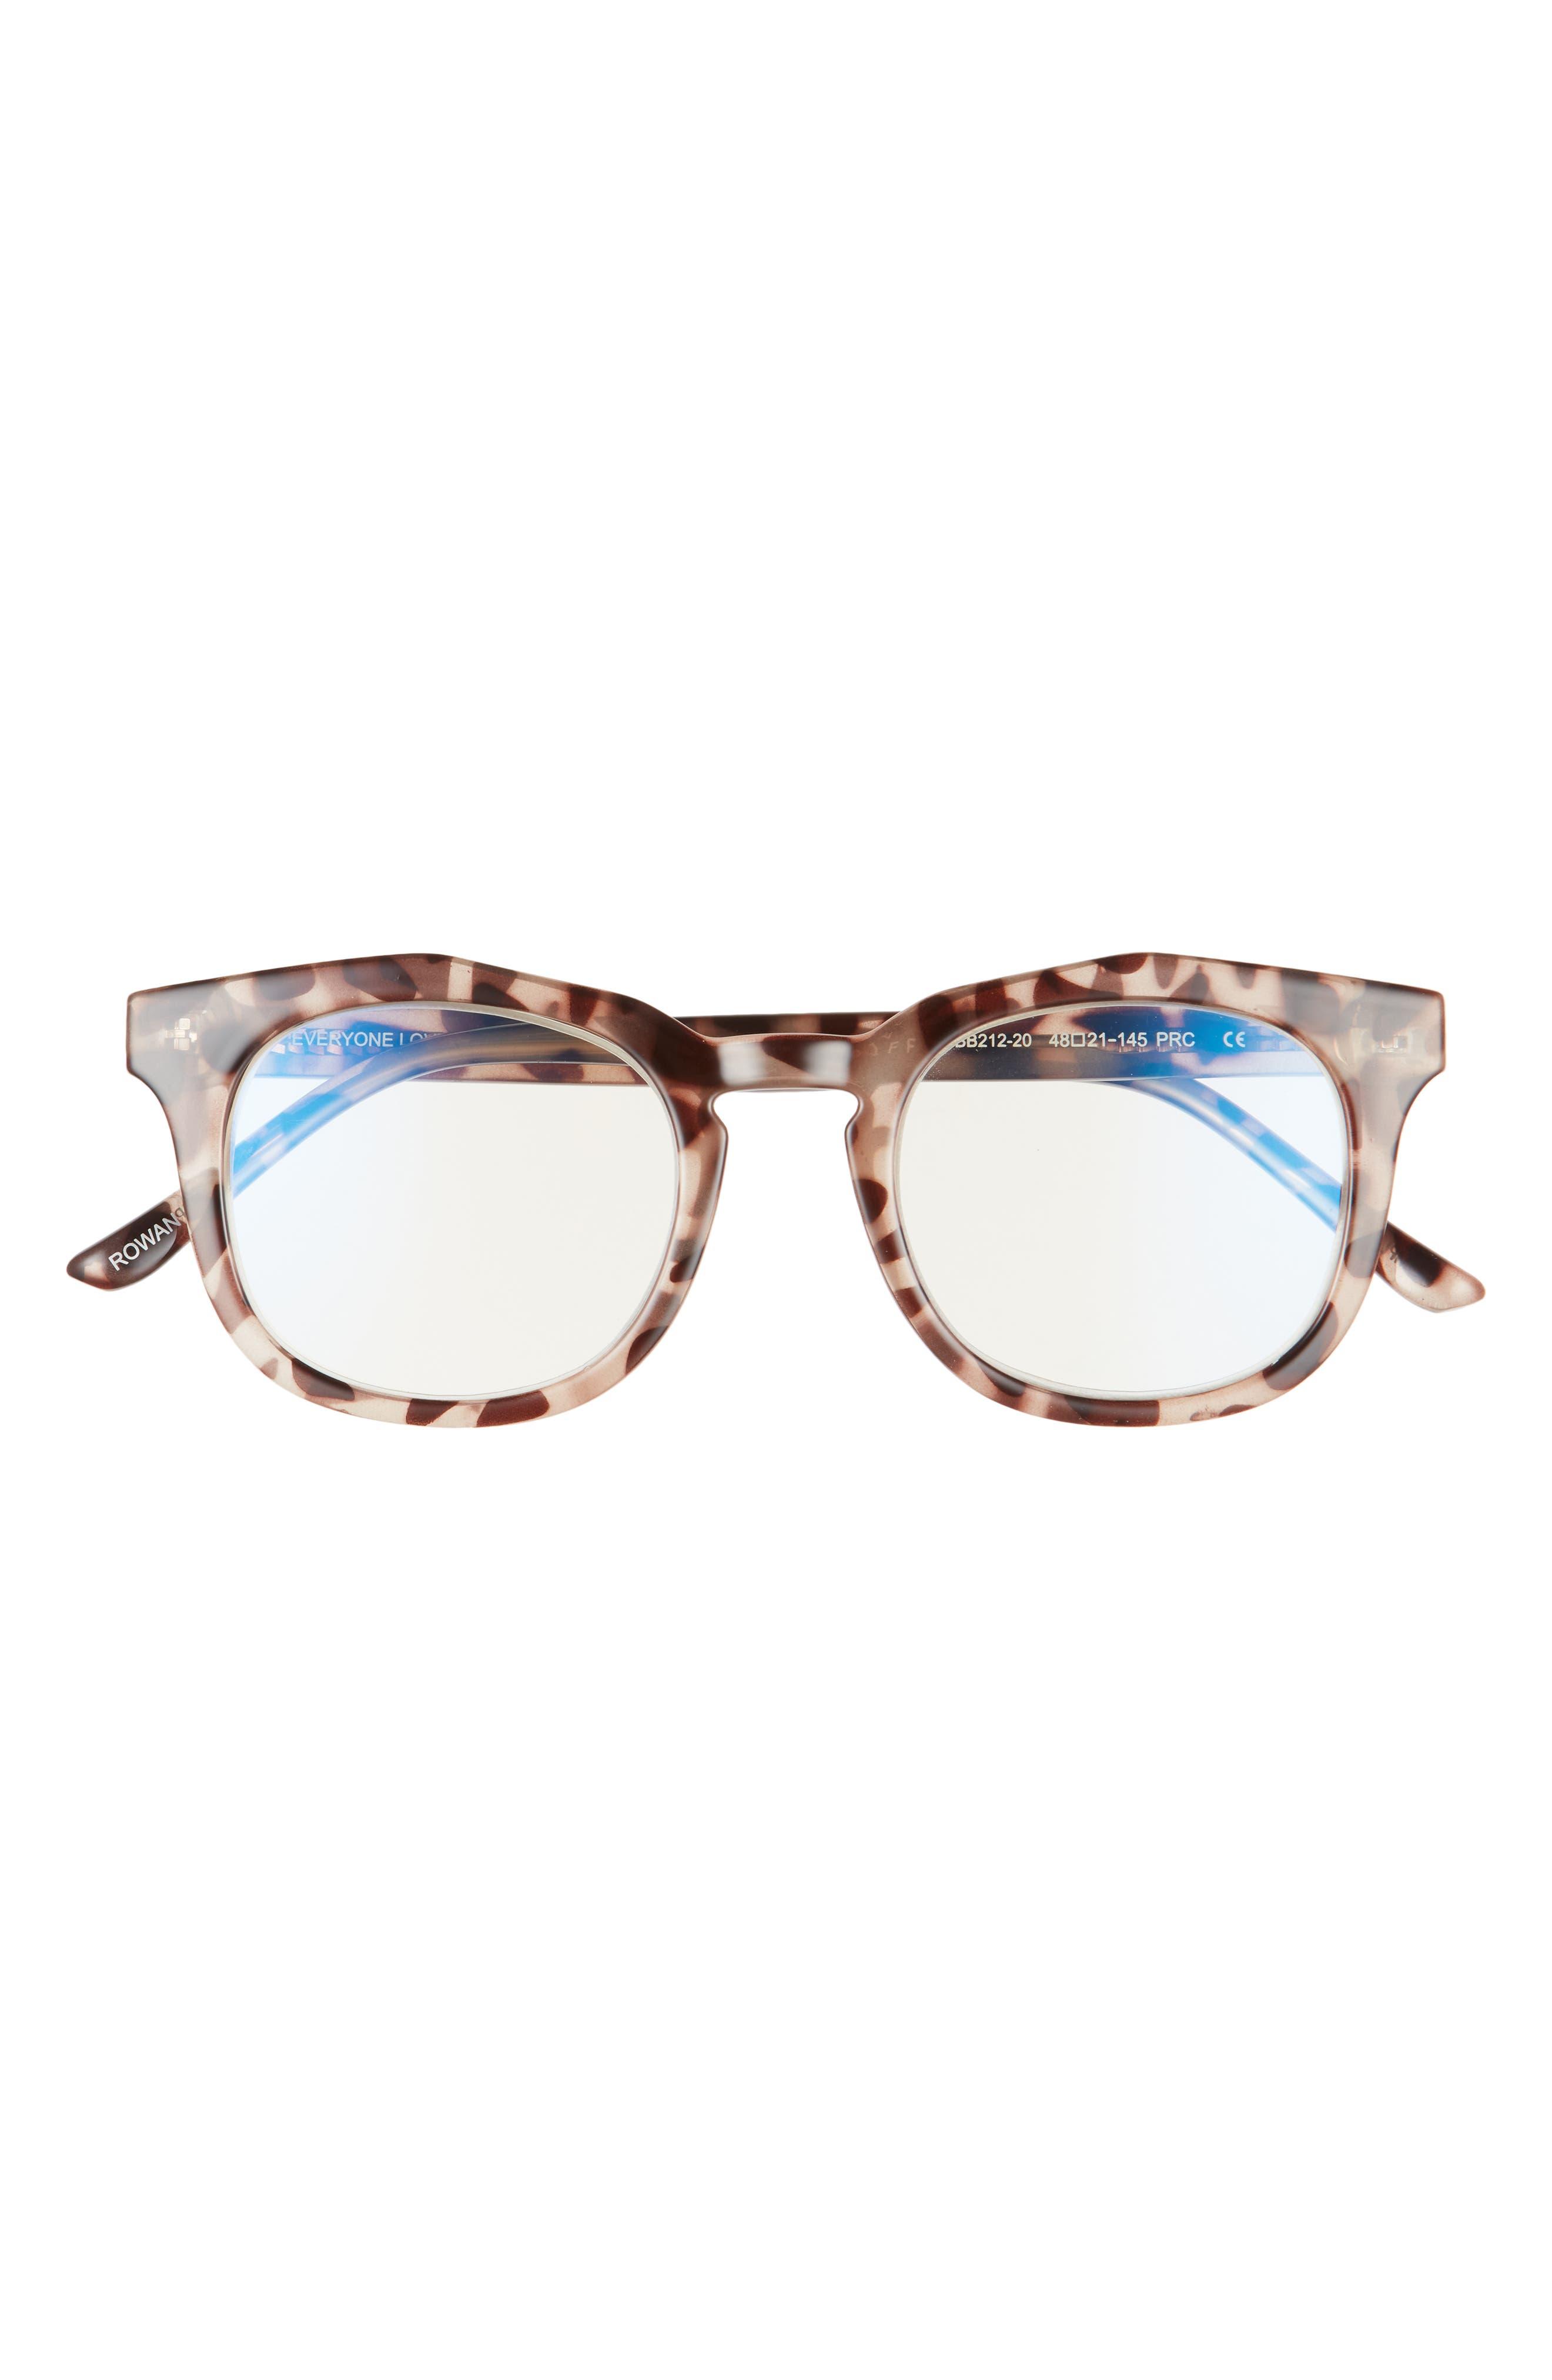 Rowan 50mm Small Blue Light Blocking Reading Glasses